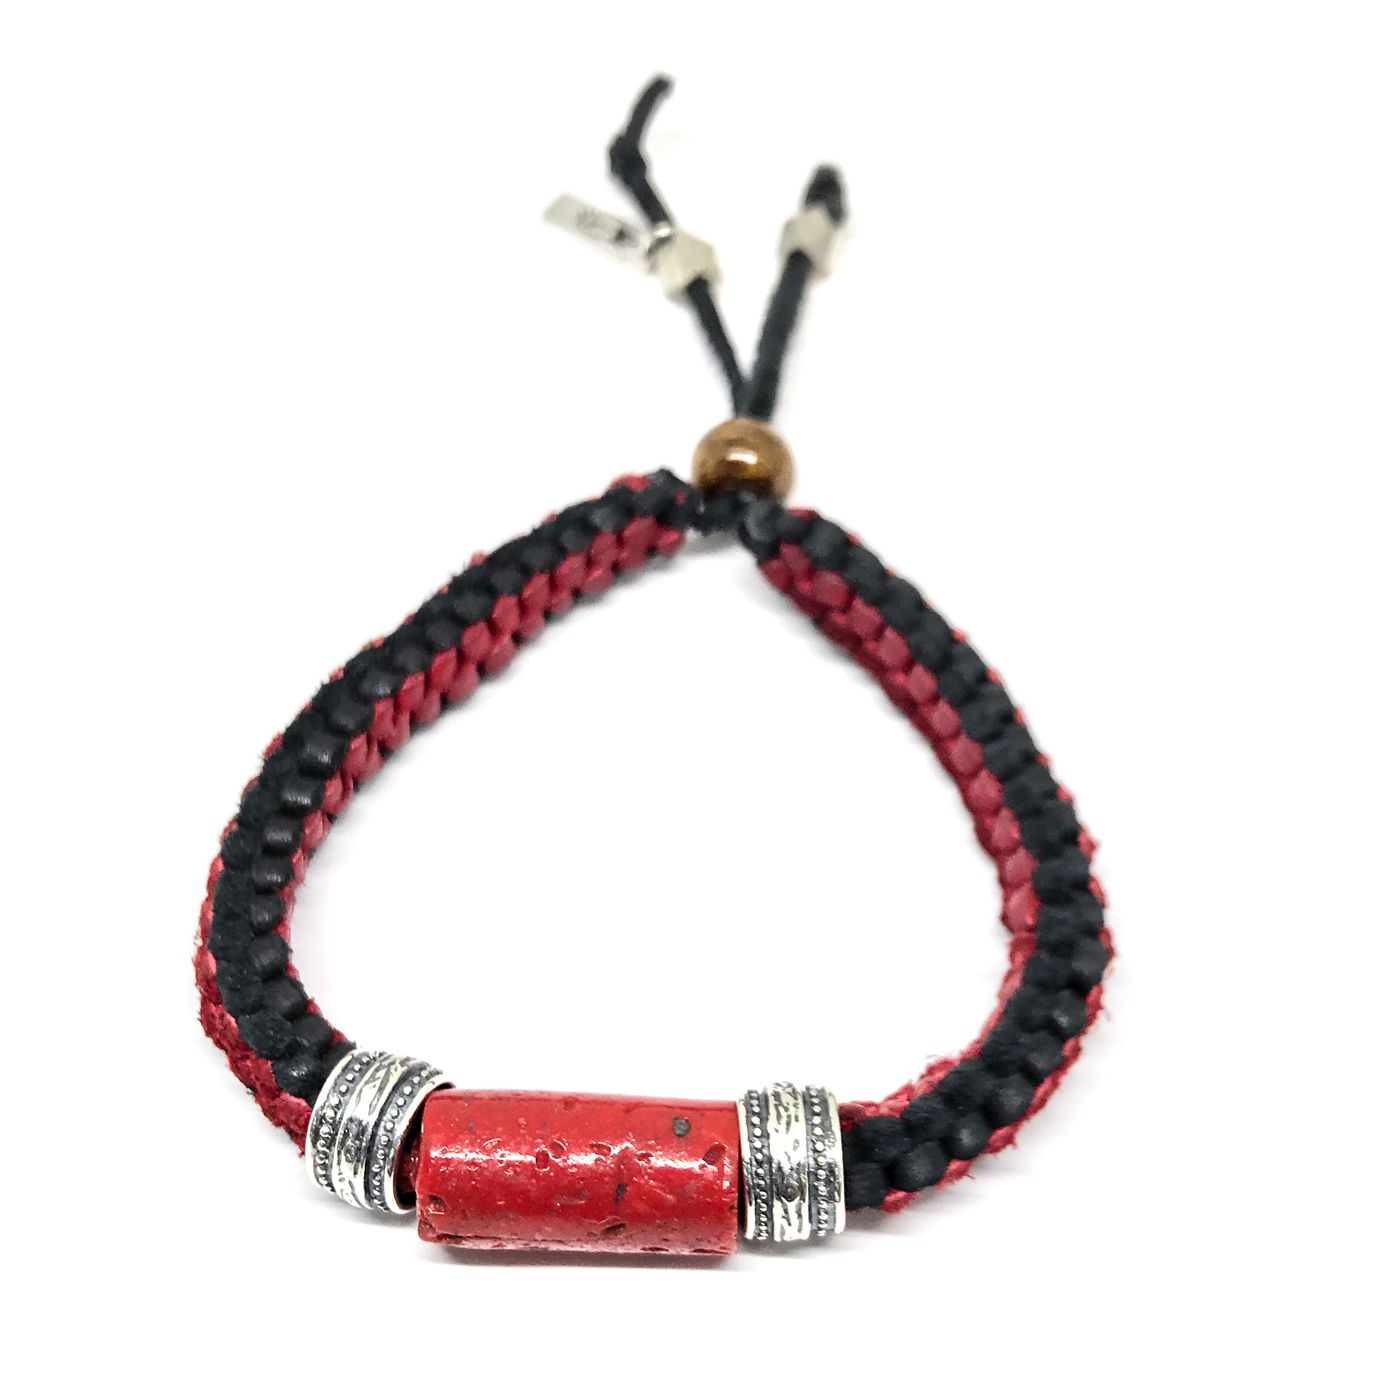 Limited edition coral u leather menus bracelet bracelets and beads